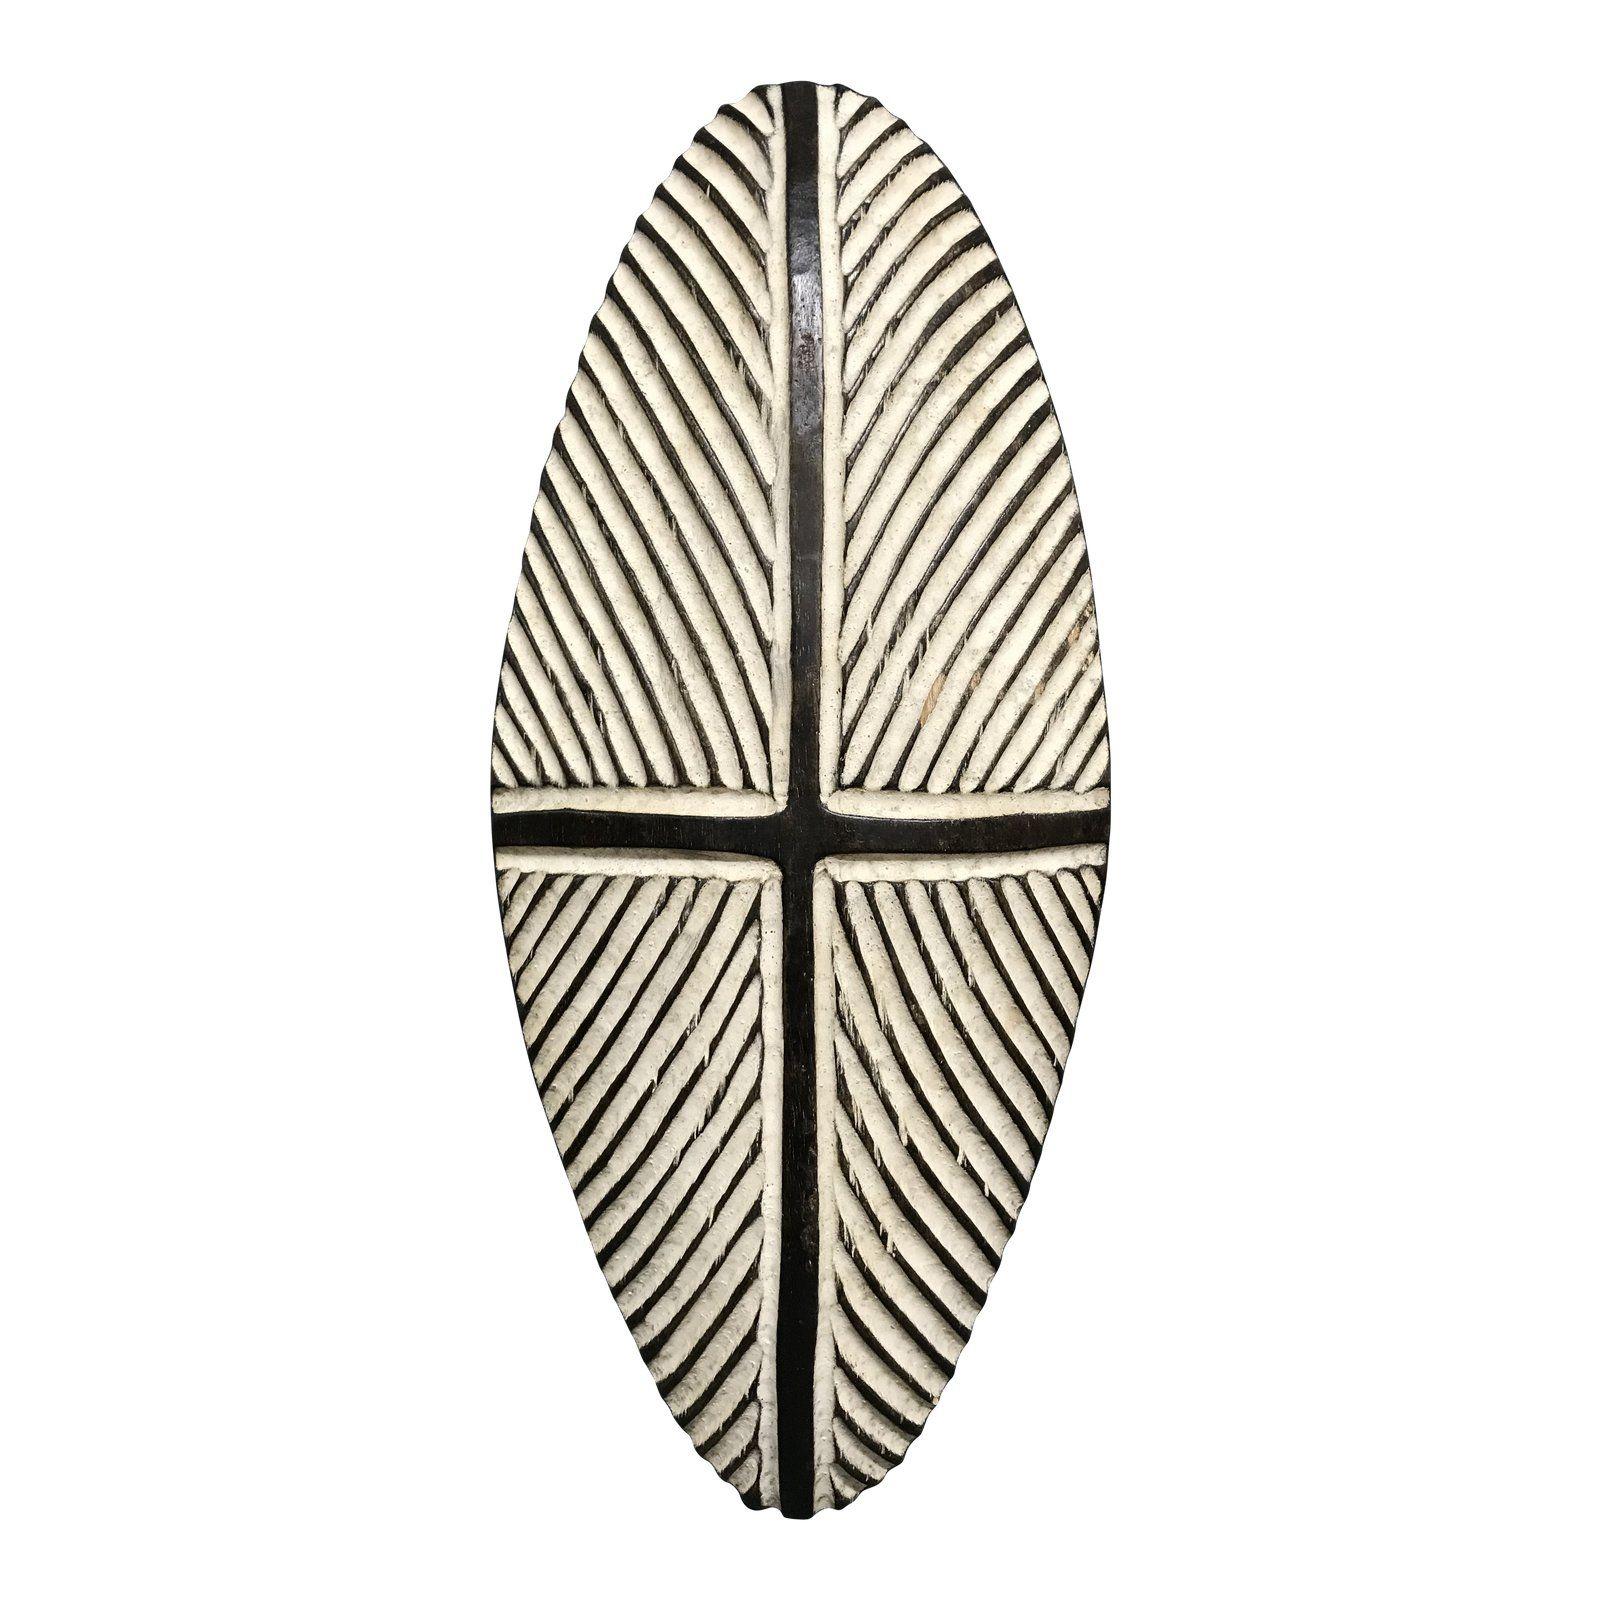 African Tribal Art Zulu Shield | African Home Decor in 2019